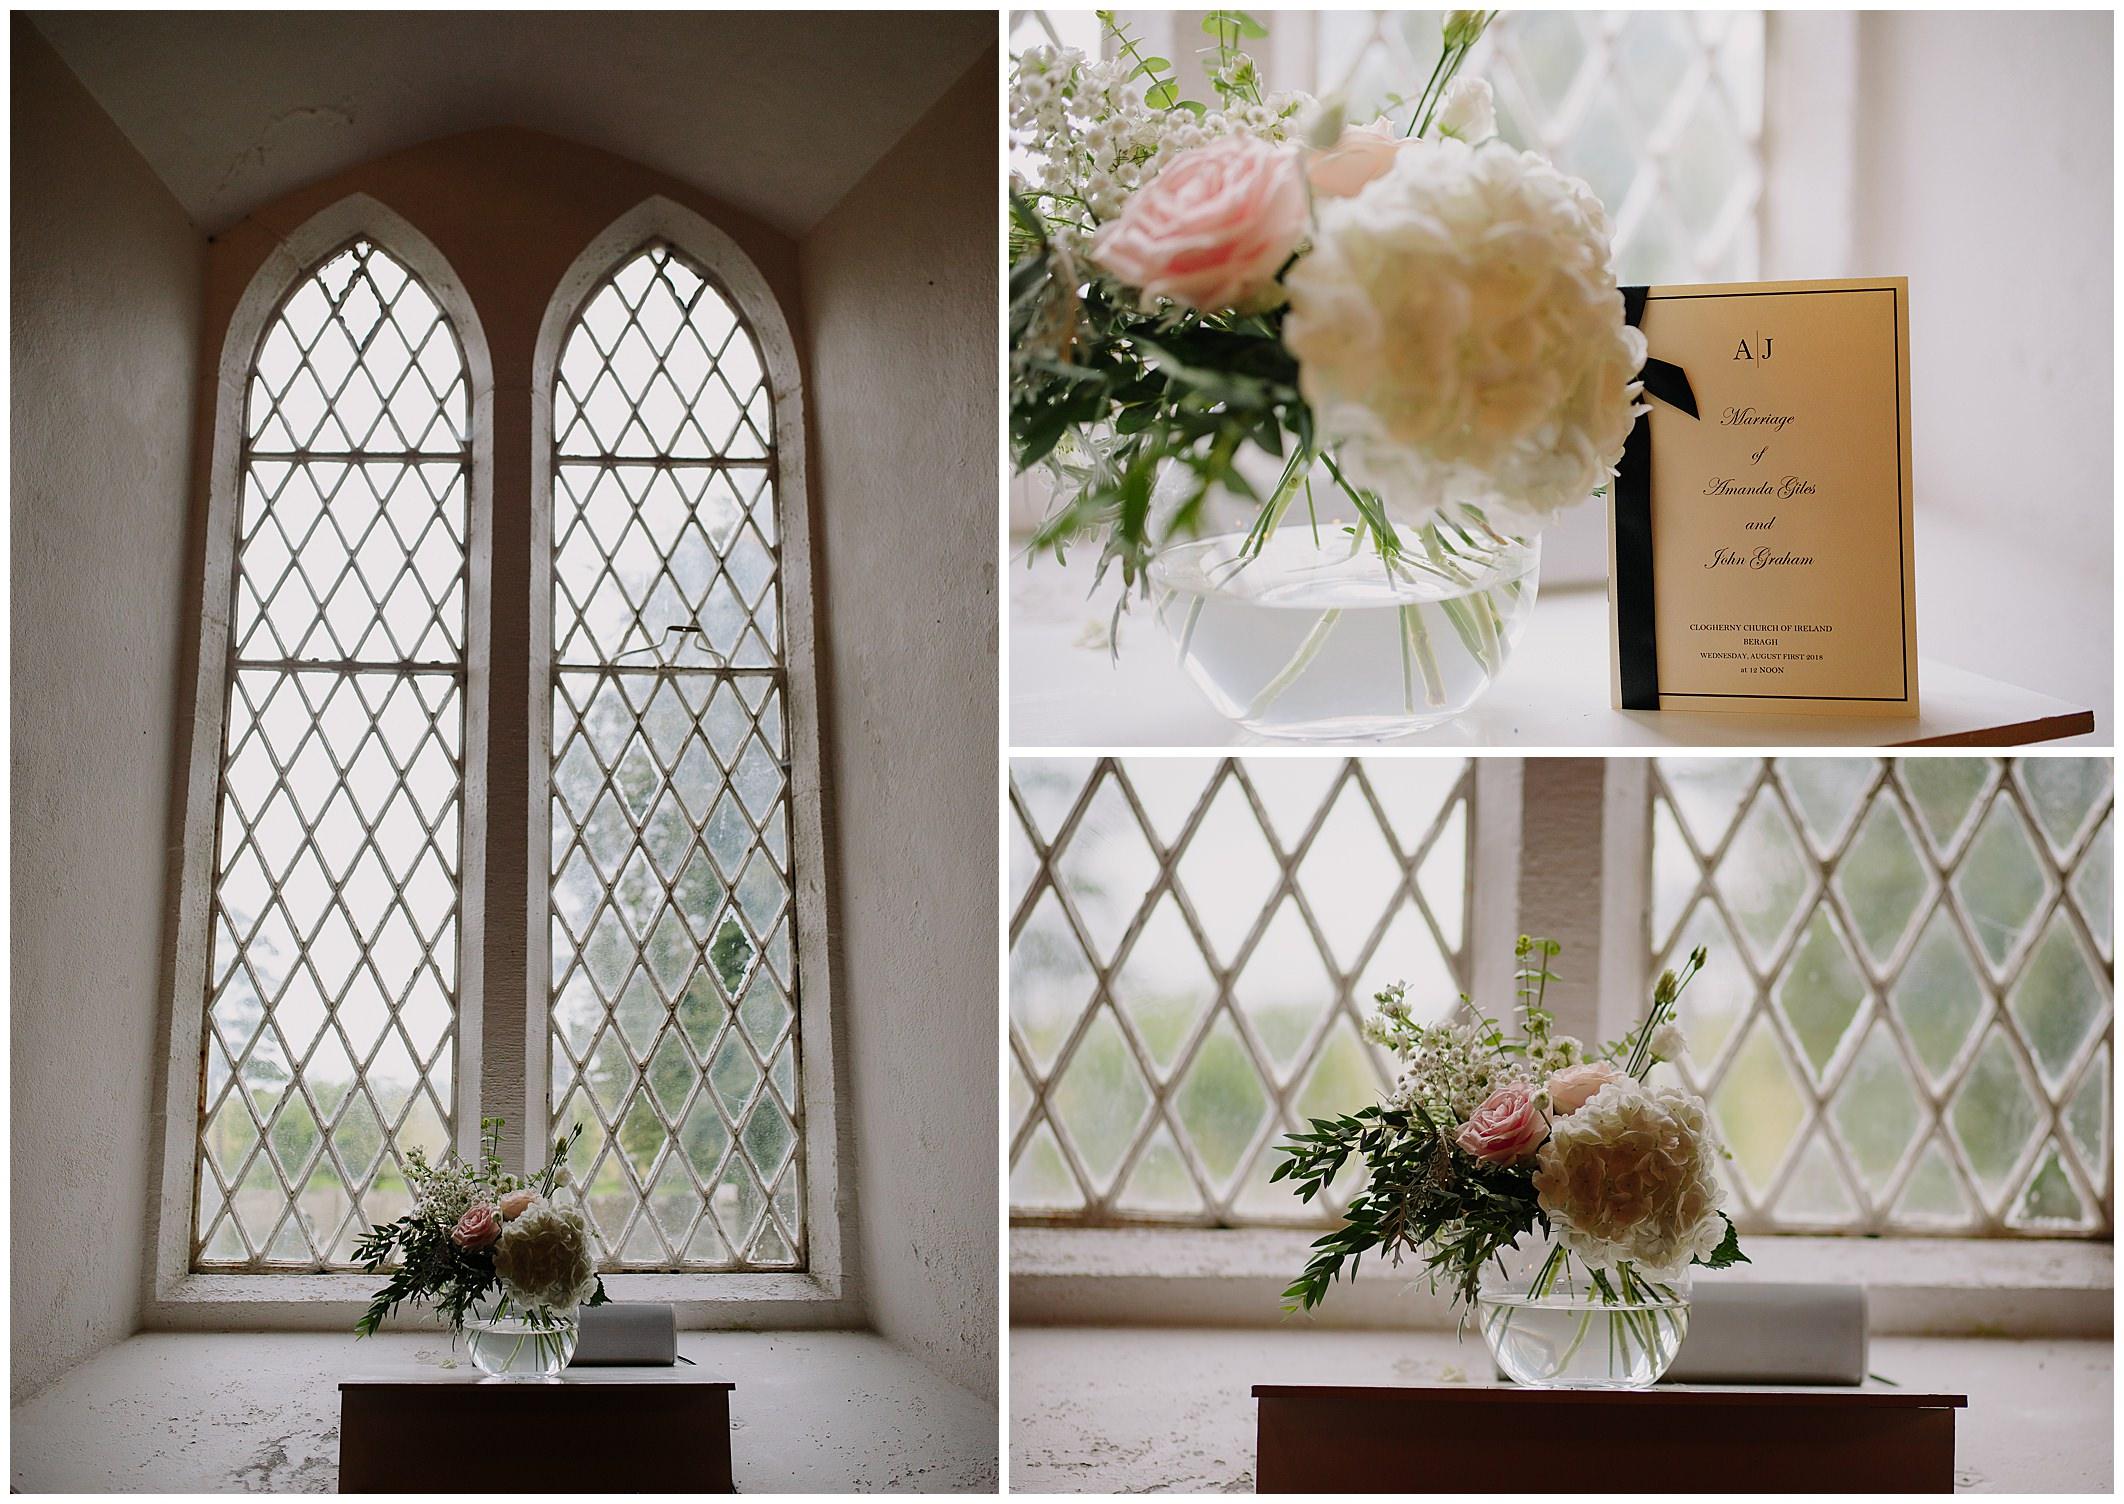 farnham-estate-wedding-jude-browne-photography_0064.jpg